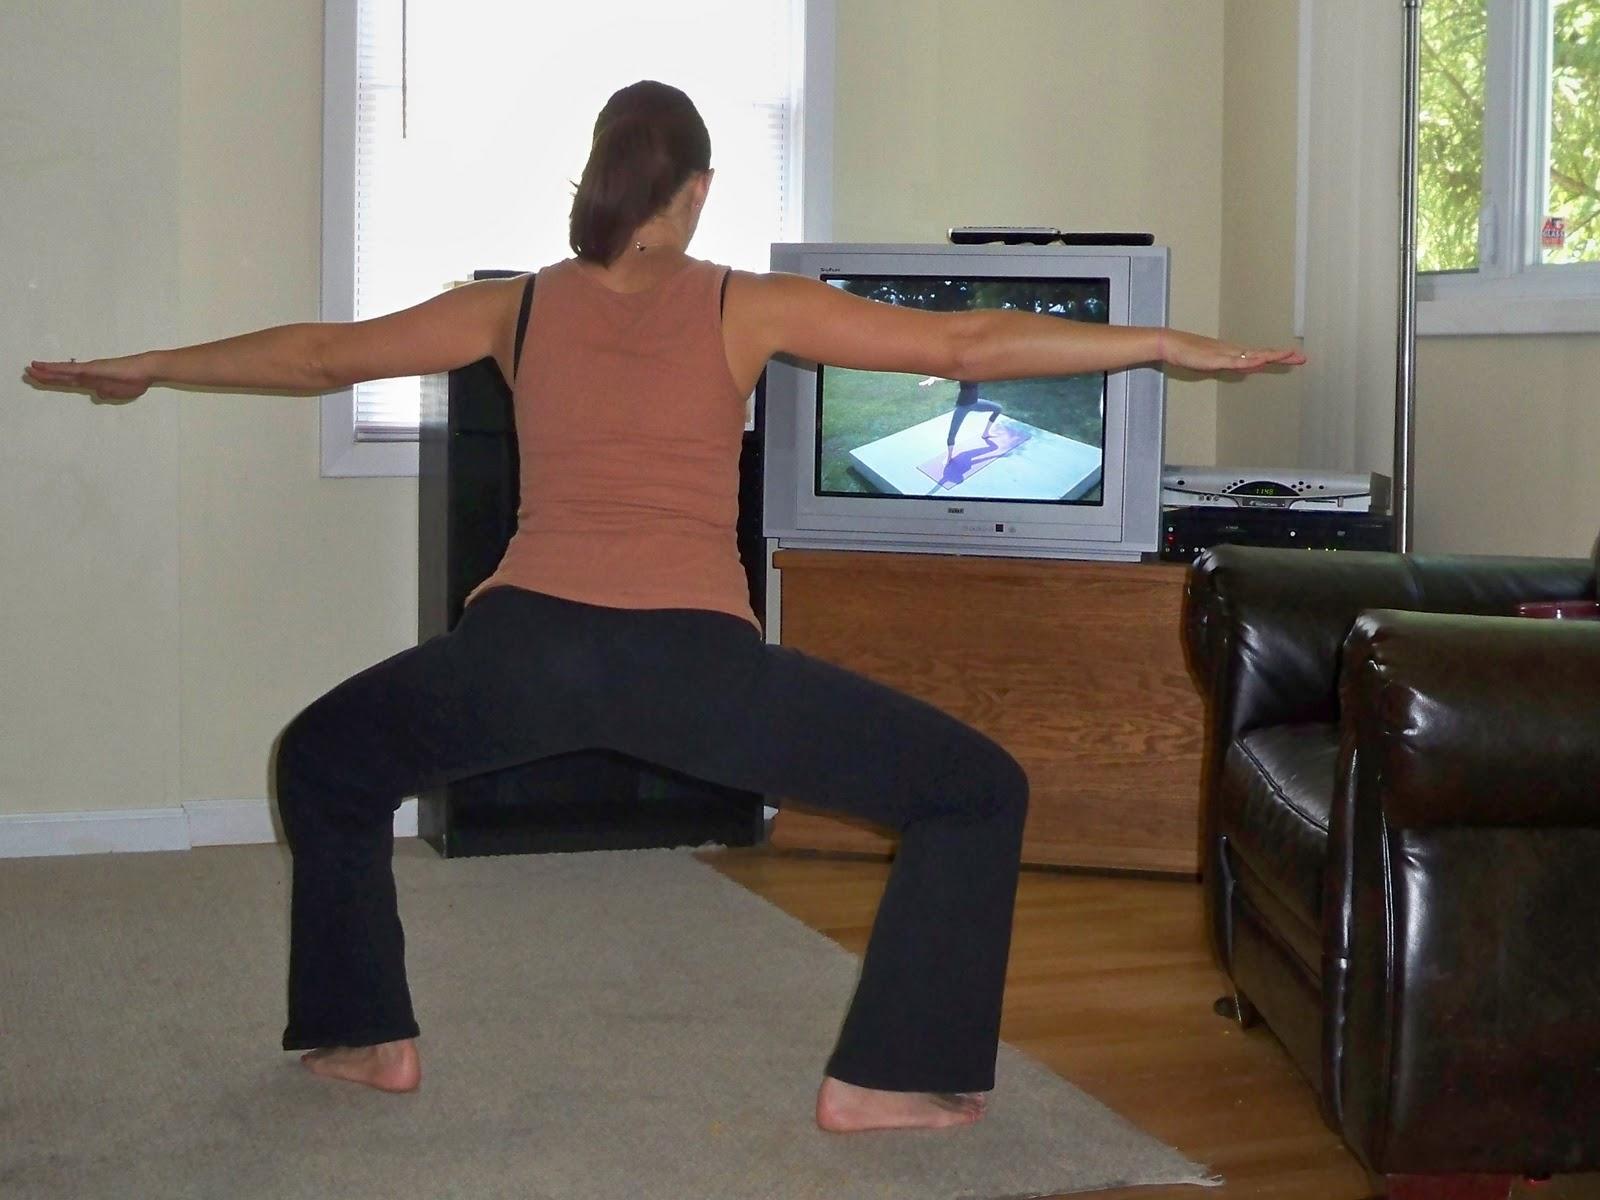 Kirsten Dunst Weight Loss - Viewing Gallery